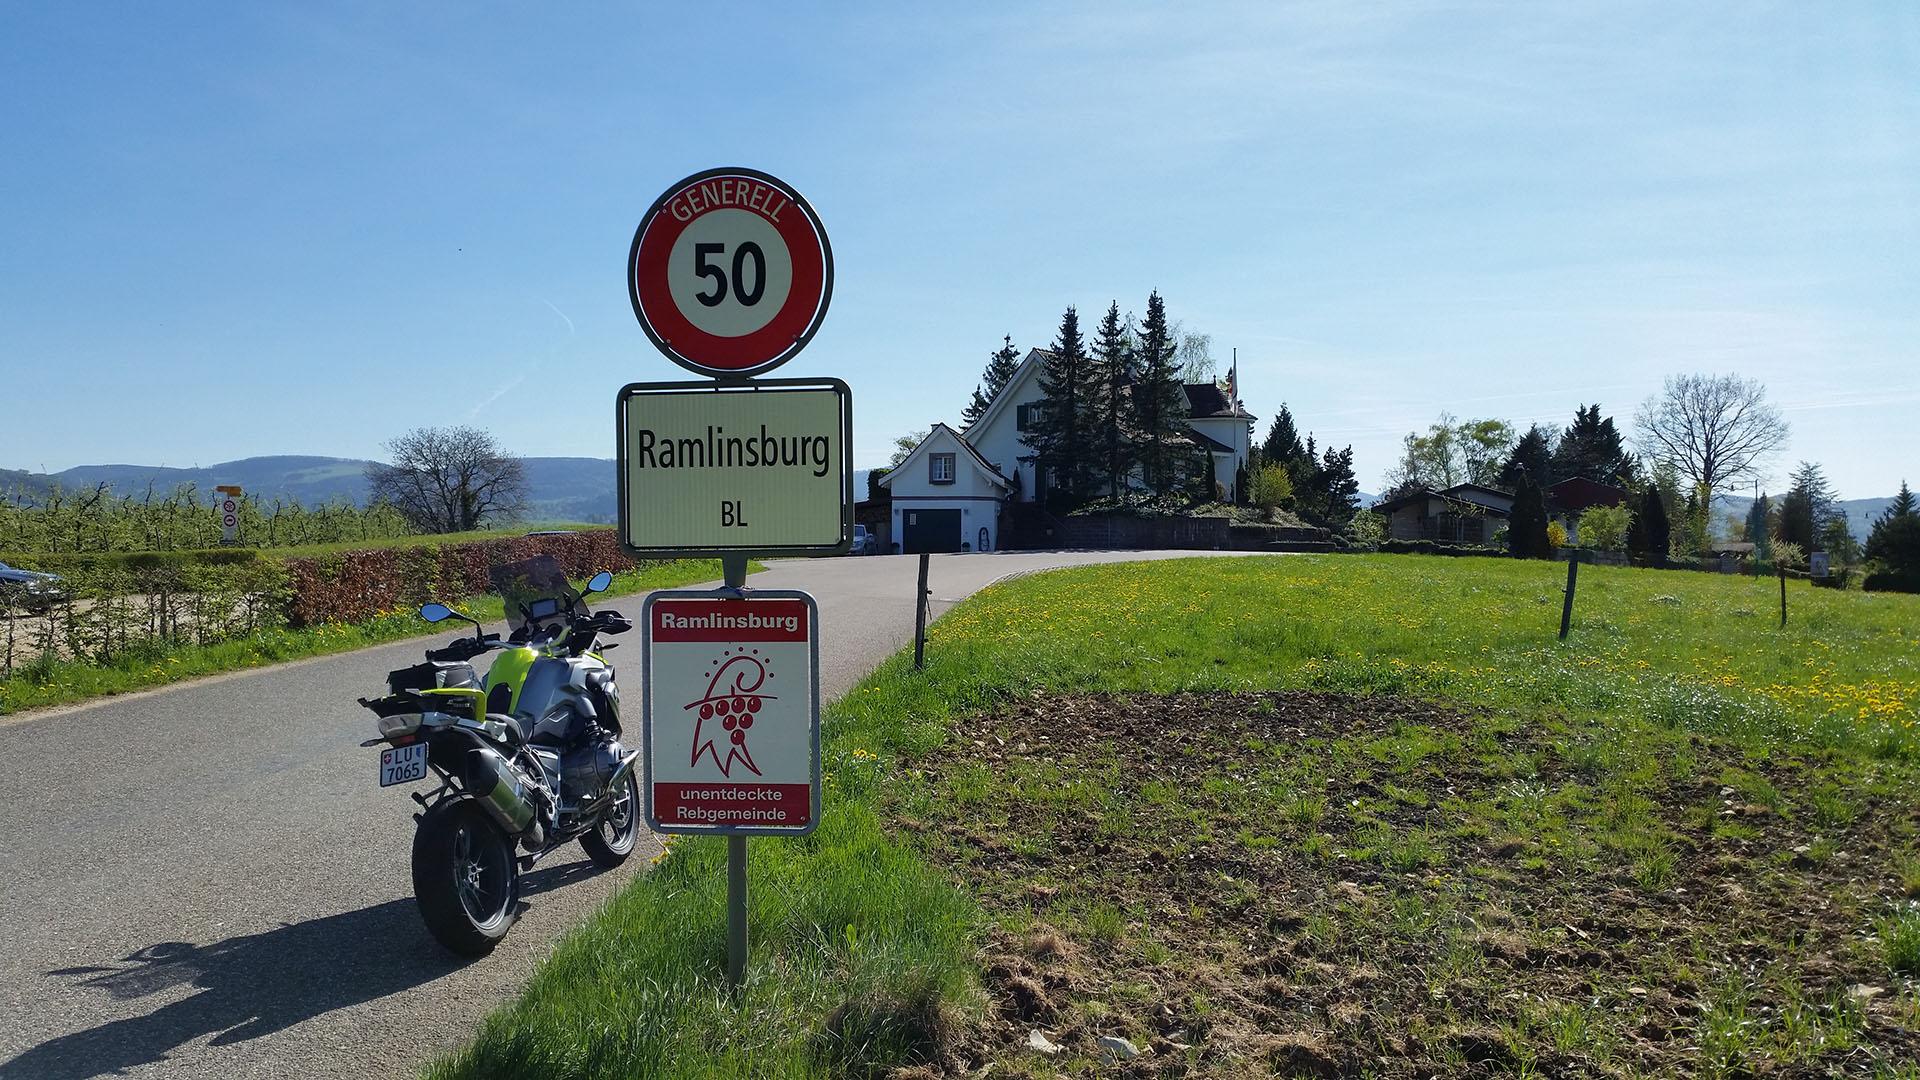 0521 - CH - Ramlinsburg